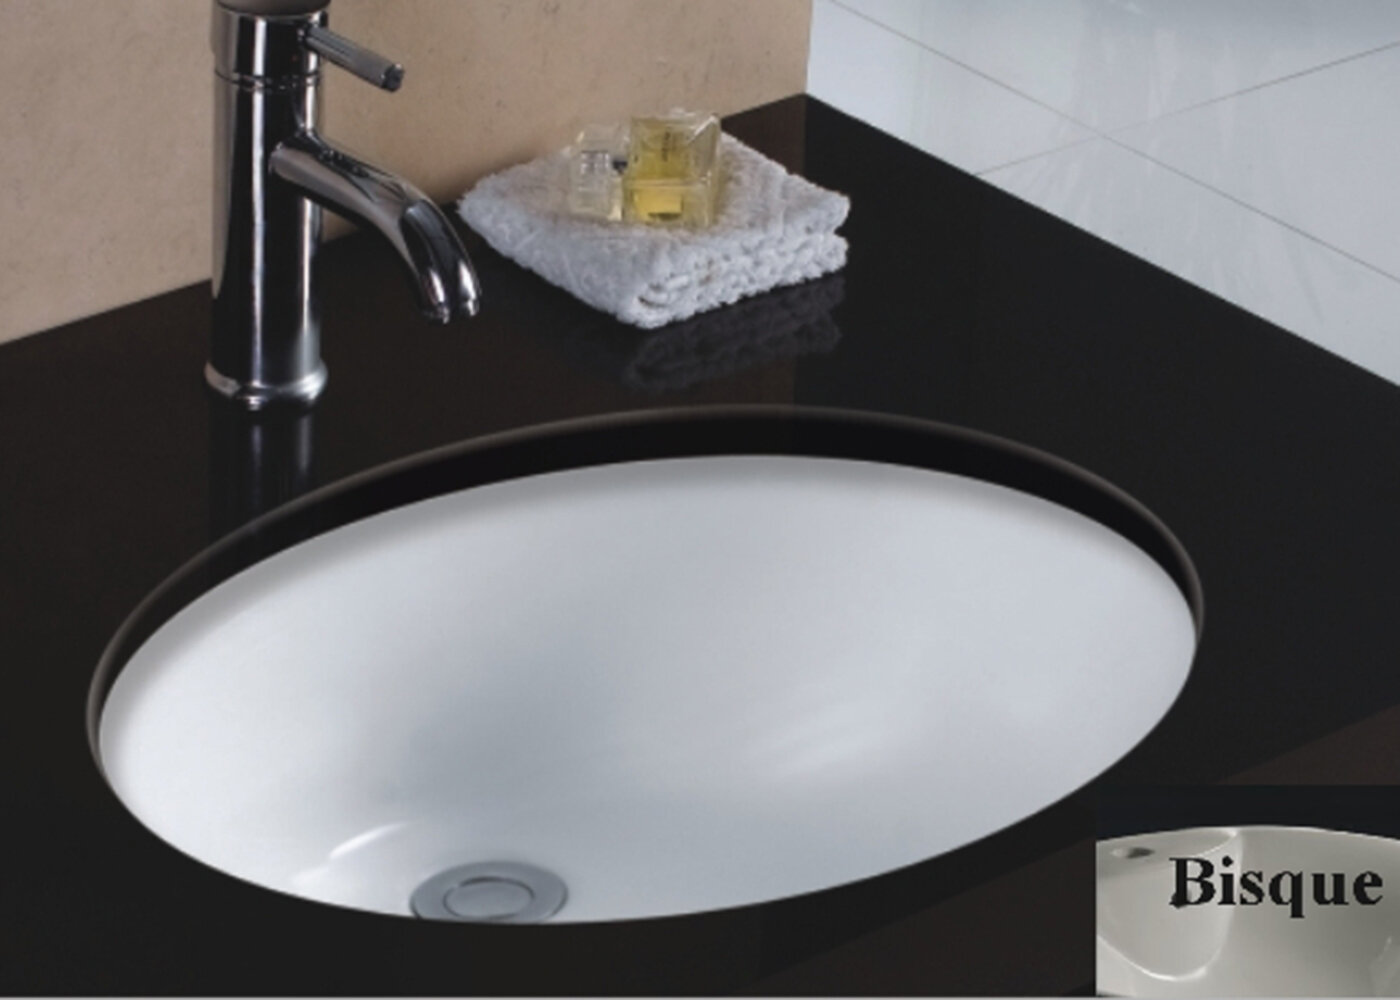 Rhythm Series Ceramic Oval Undermount Bathroom Sink with Overflow